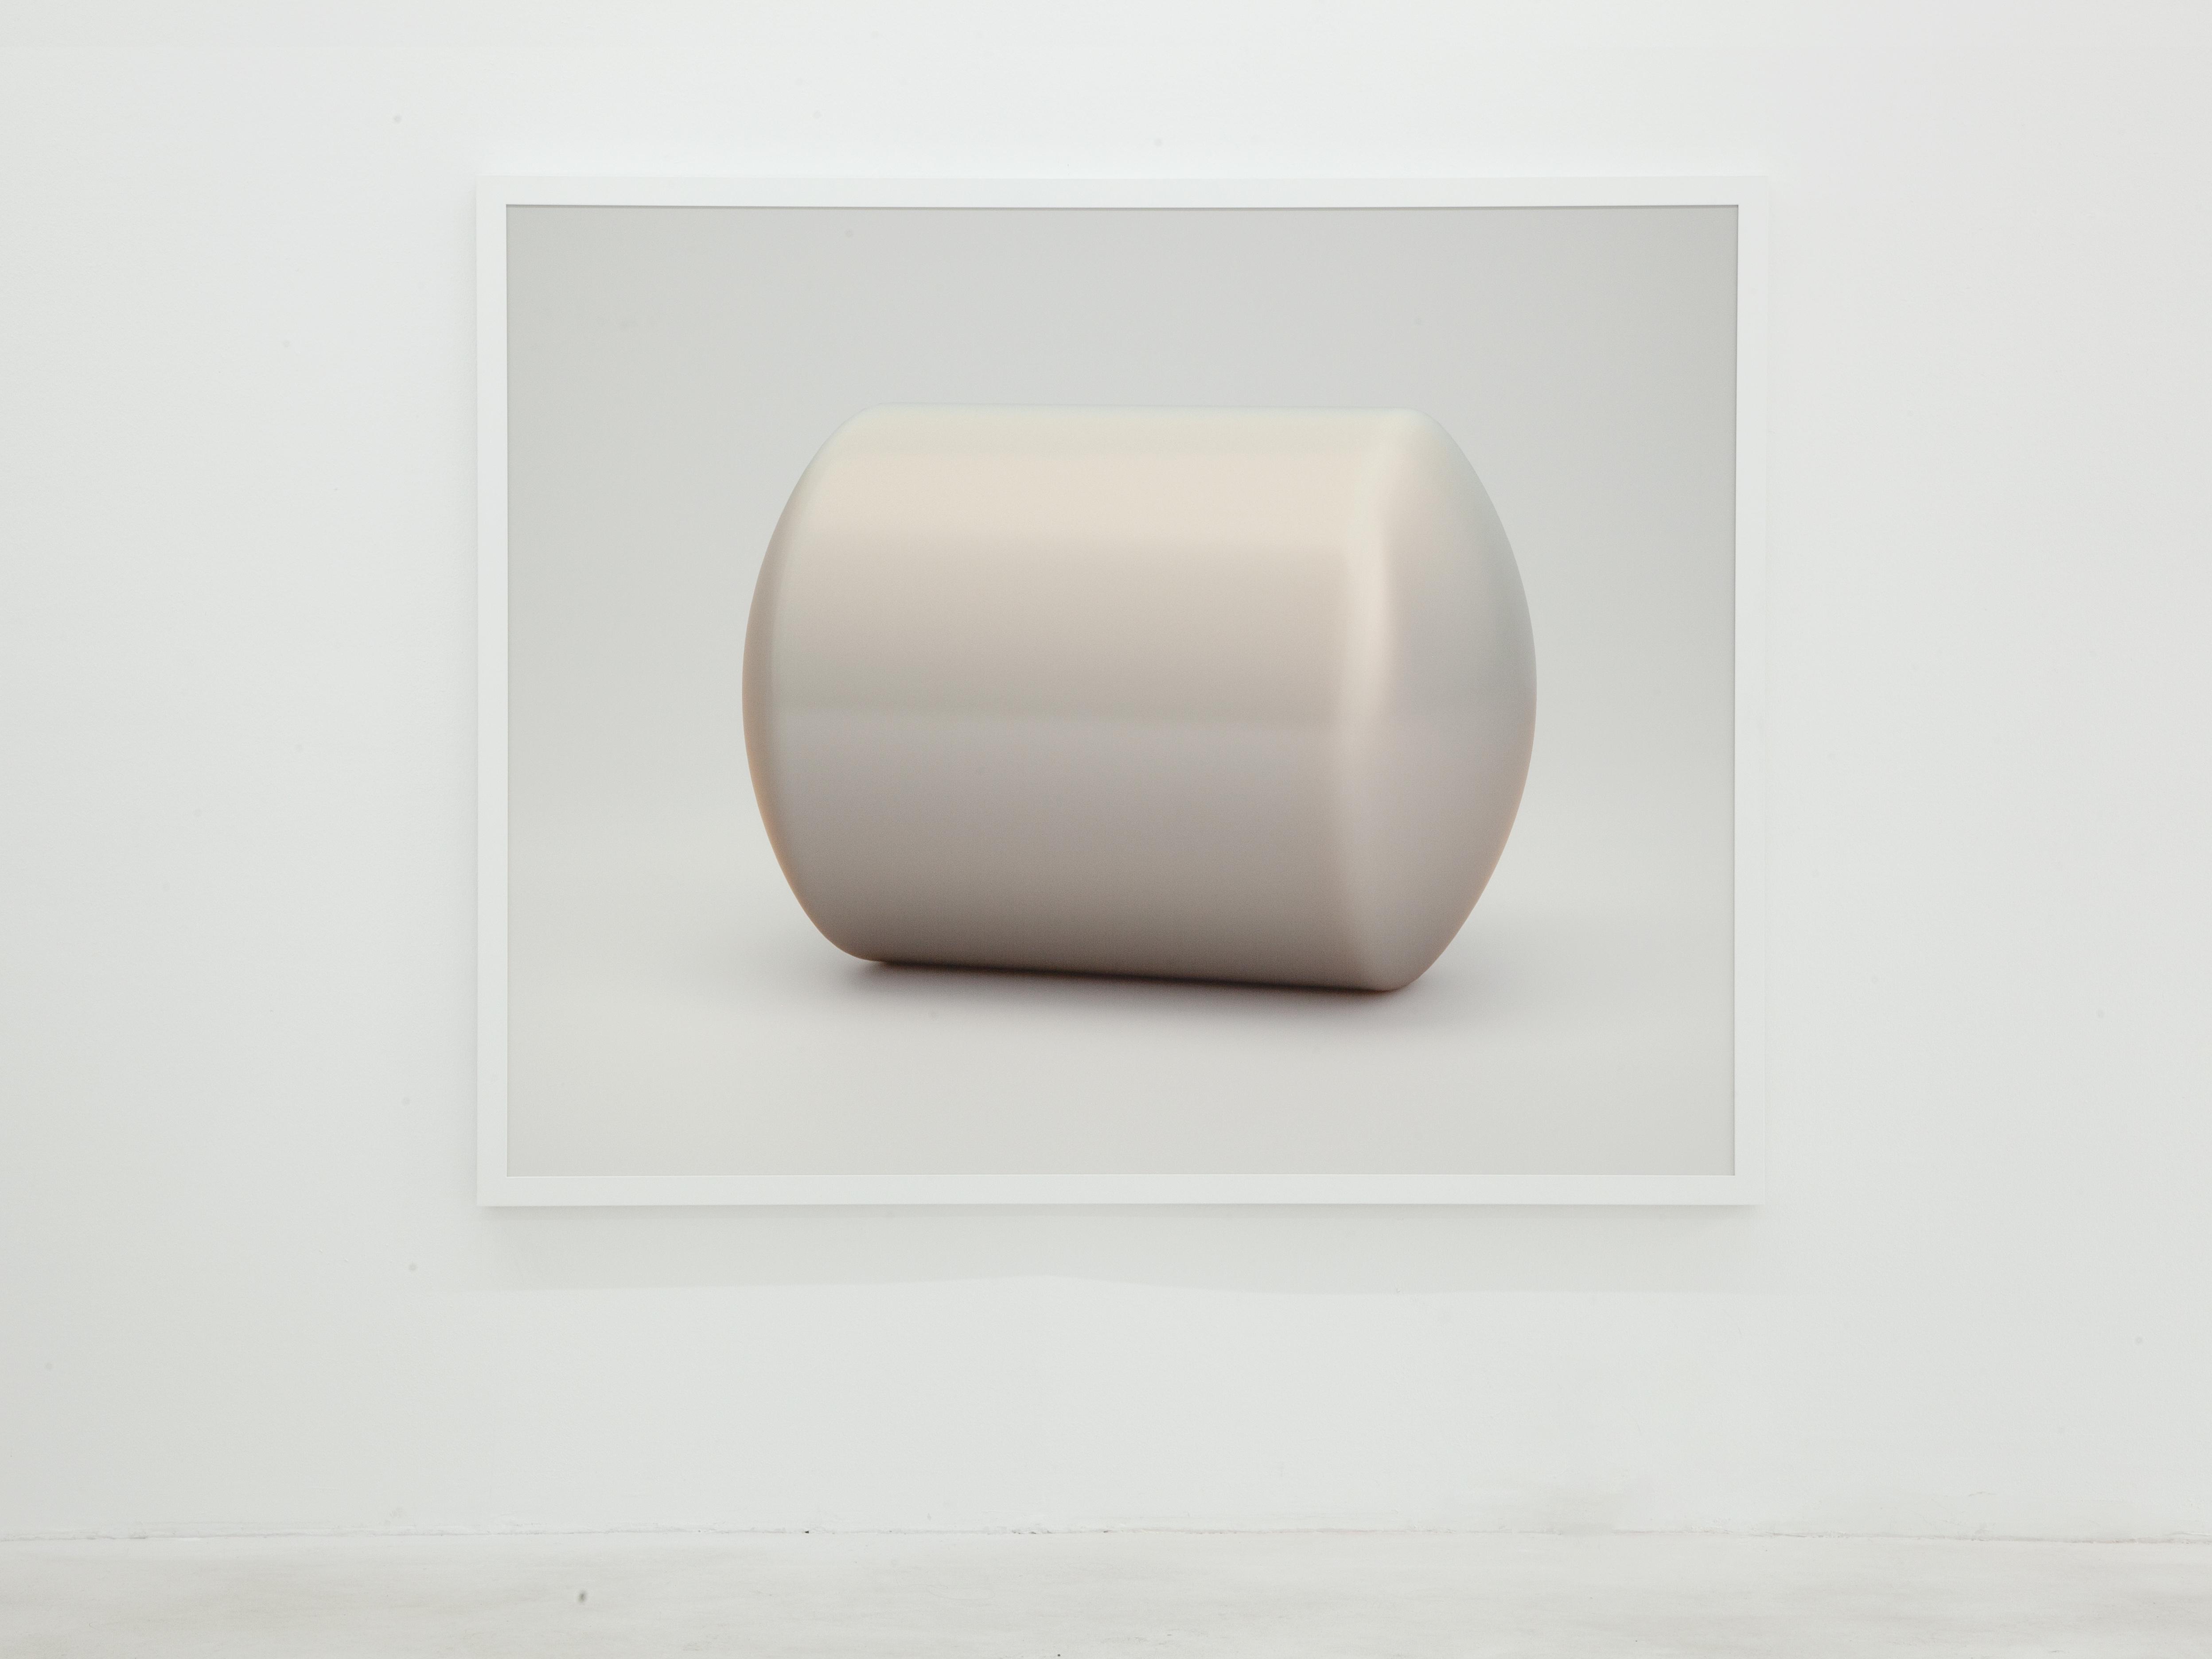 Banz & Bowinkel, Primitive I 01, CGI, 175 cm x 140 cm, 2018